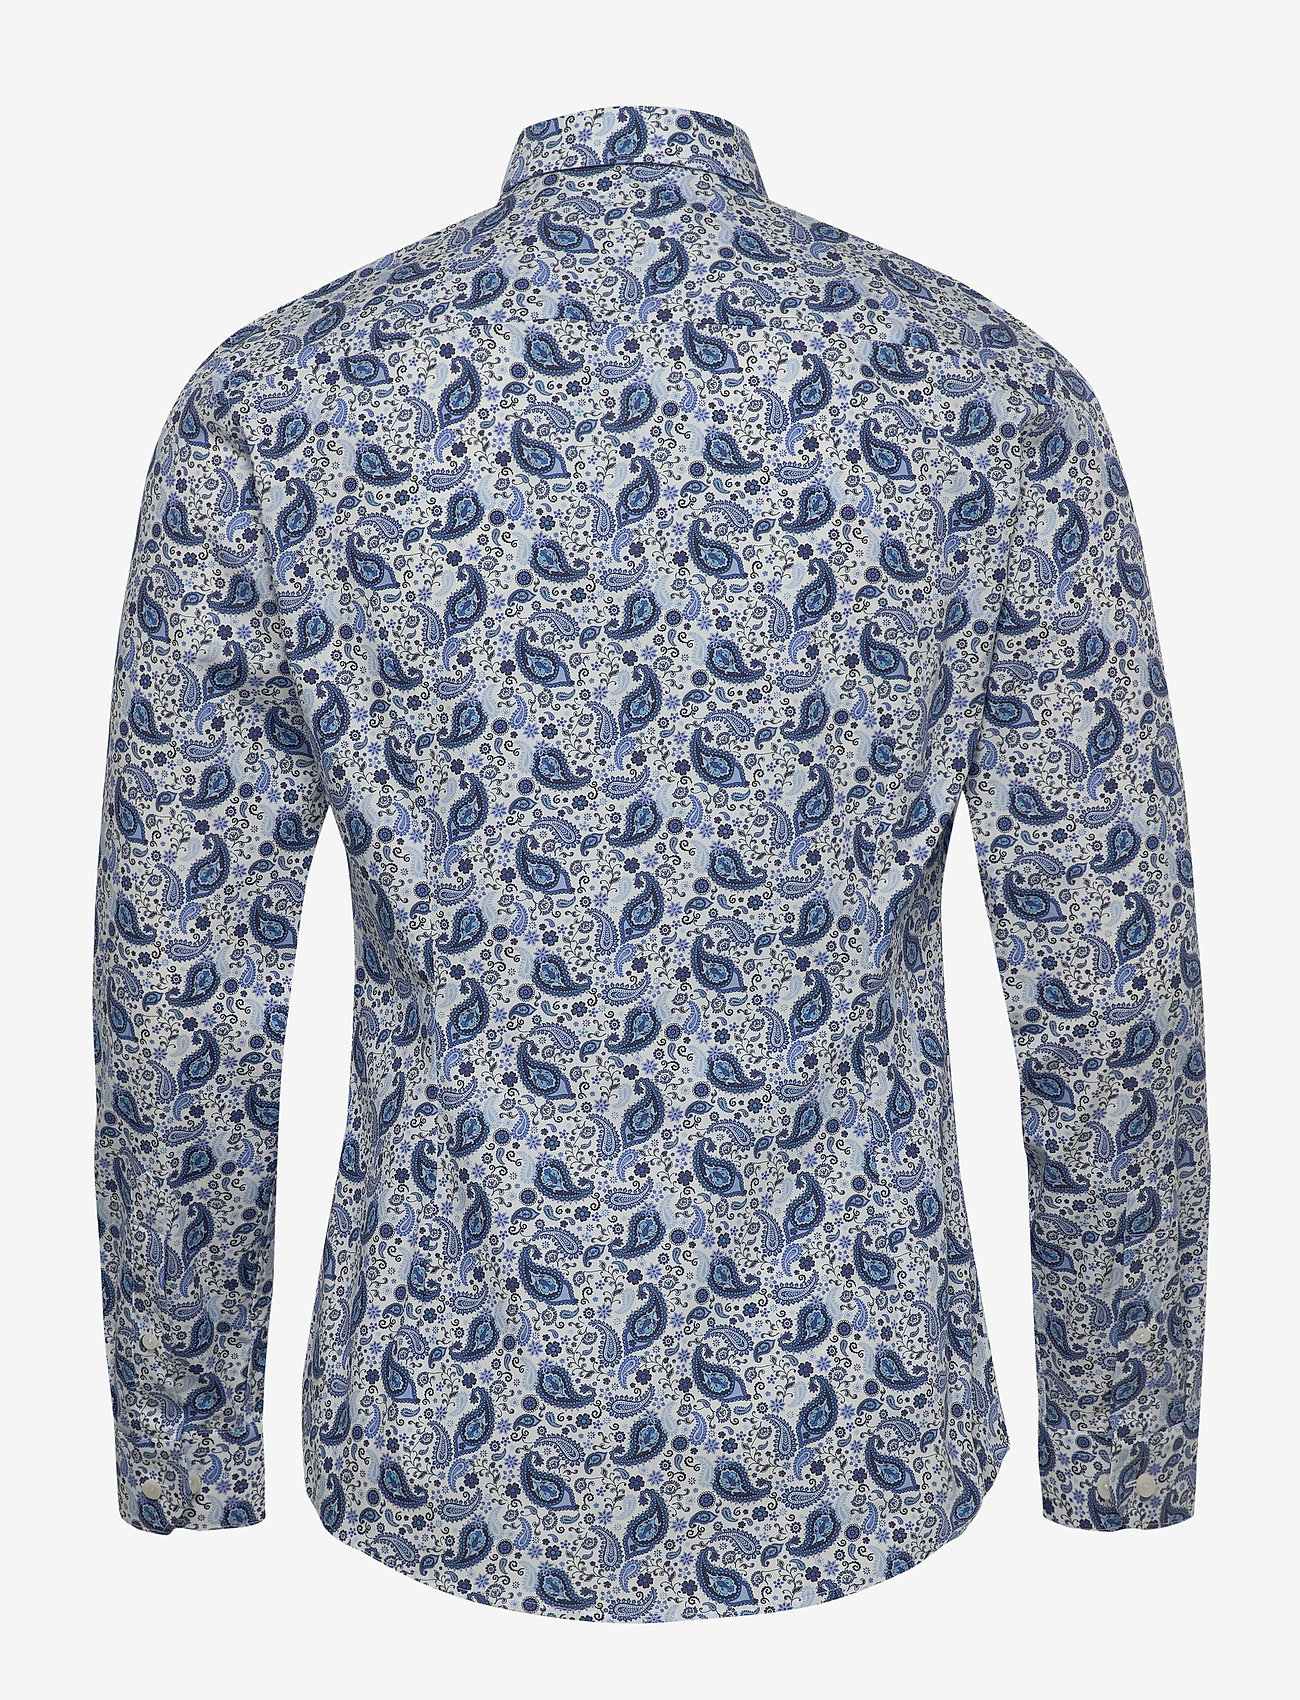 Blue Paisley Poplin Shirt (Blue) - Eton gy5tNQ